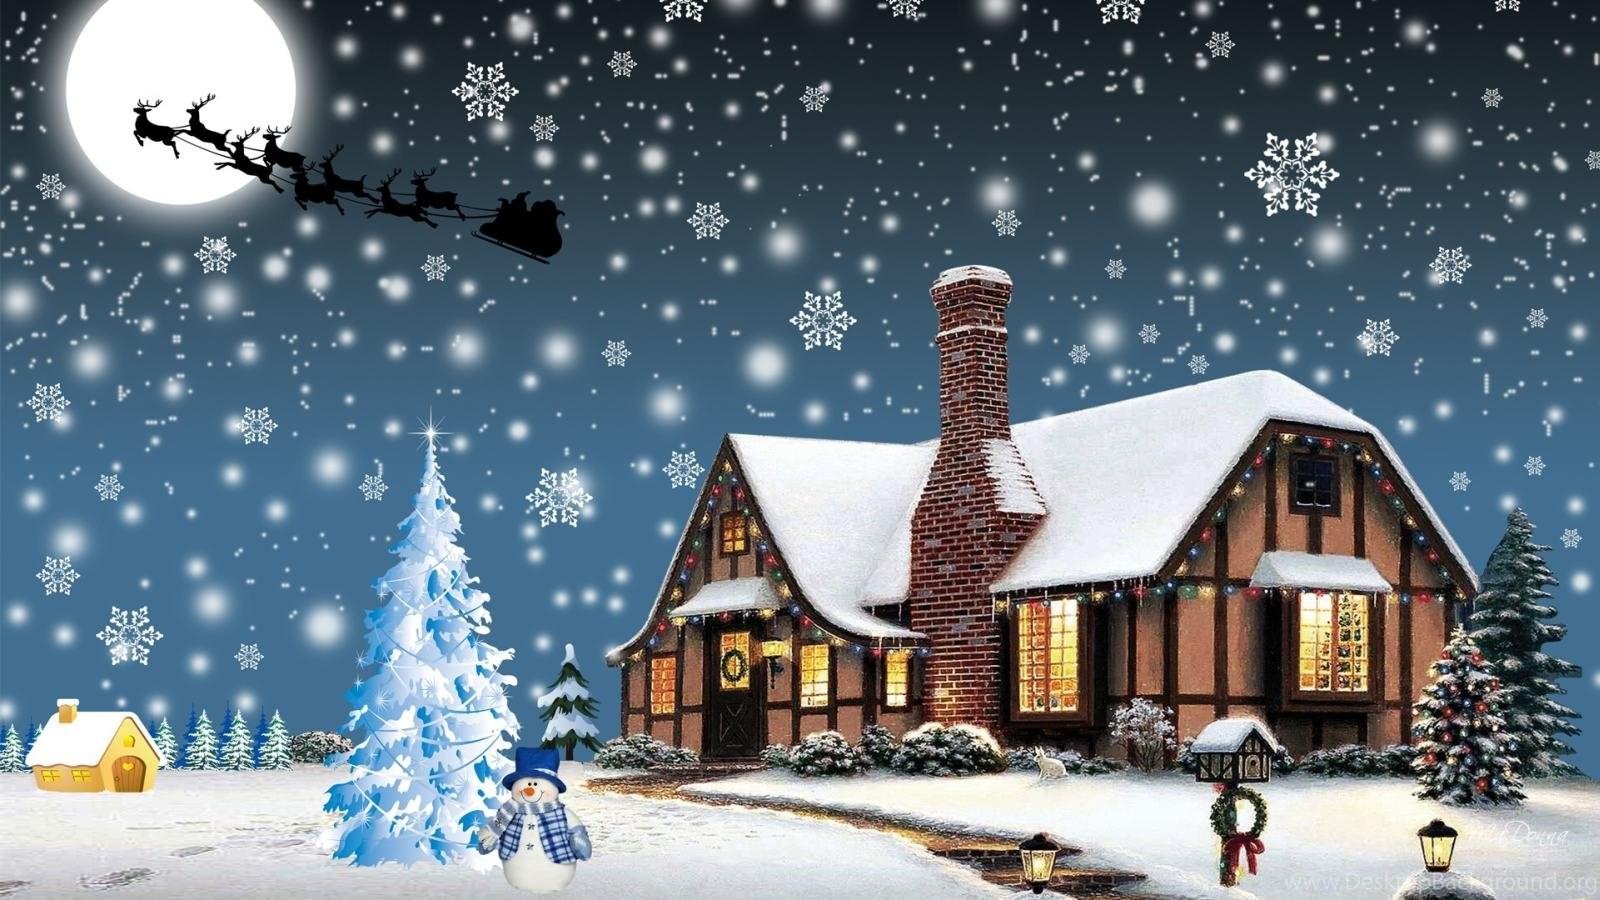 Free Download Cute Christmas Wallpapers Hd Widescreen Desktop Background